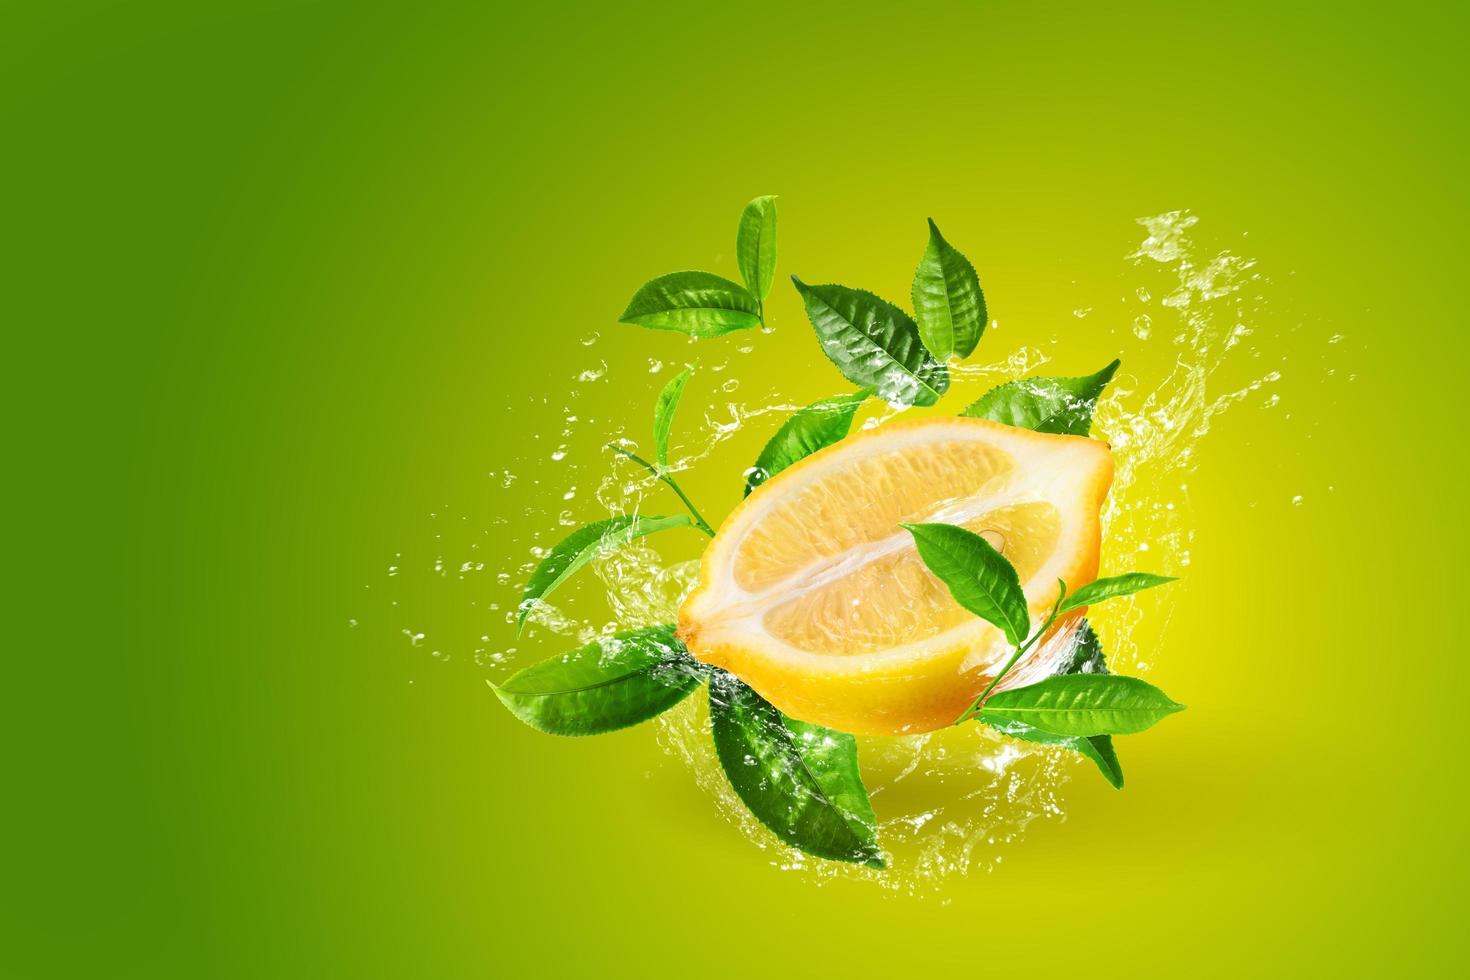 Water splashing on lemons and green tea leaf  photo